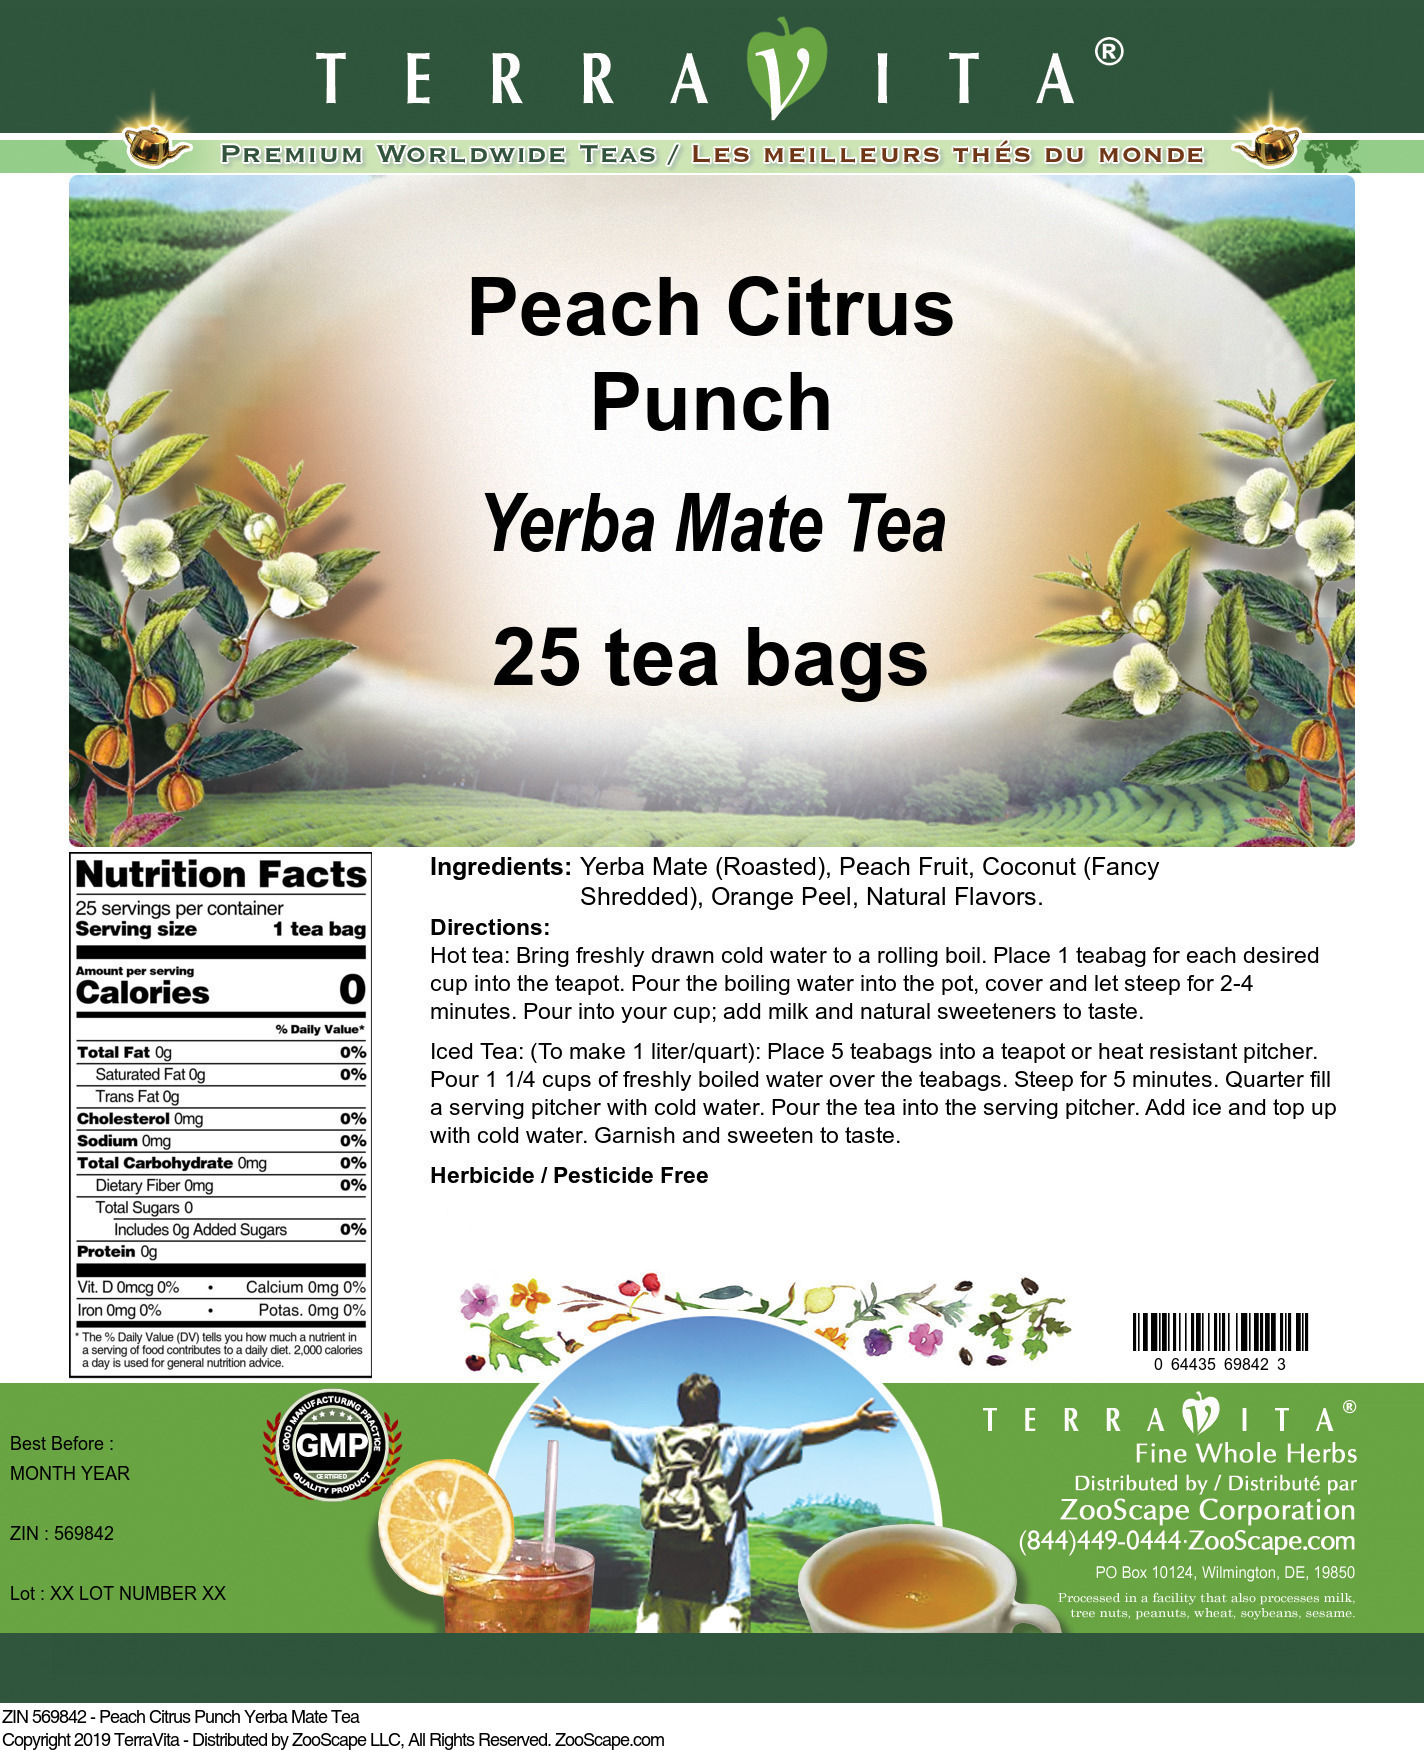 Peach Citrus Punch Yerba Mate Tea